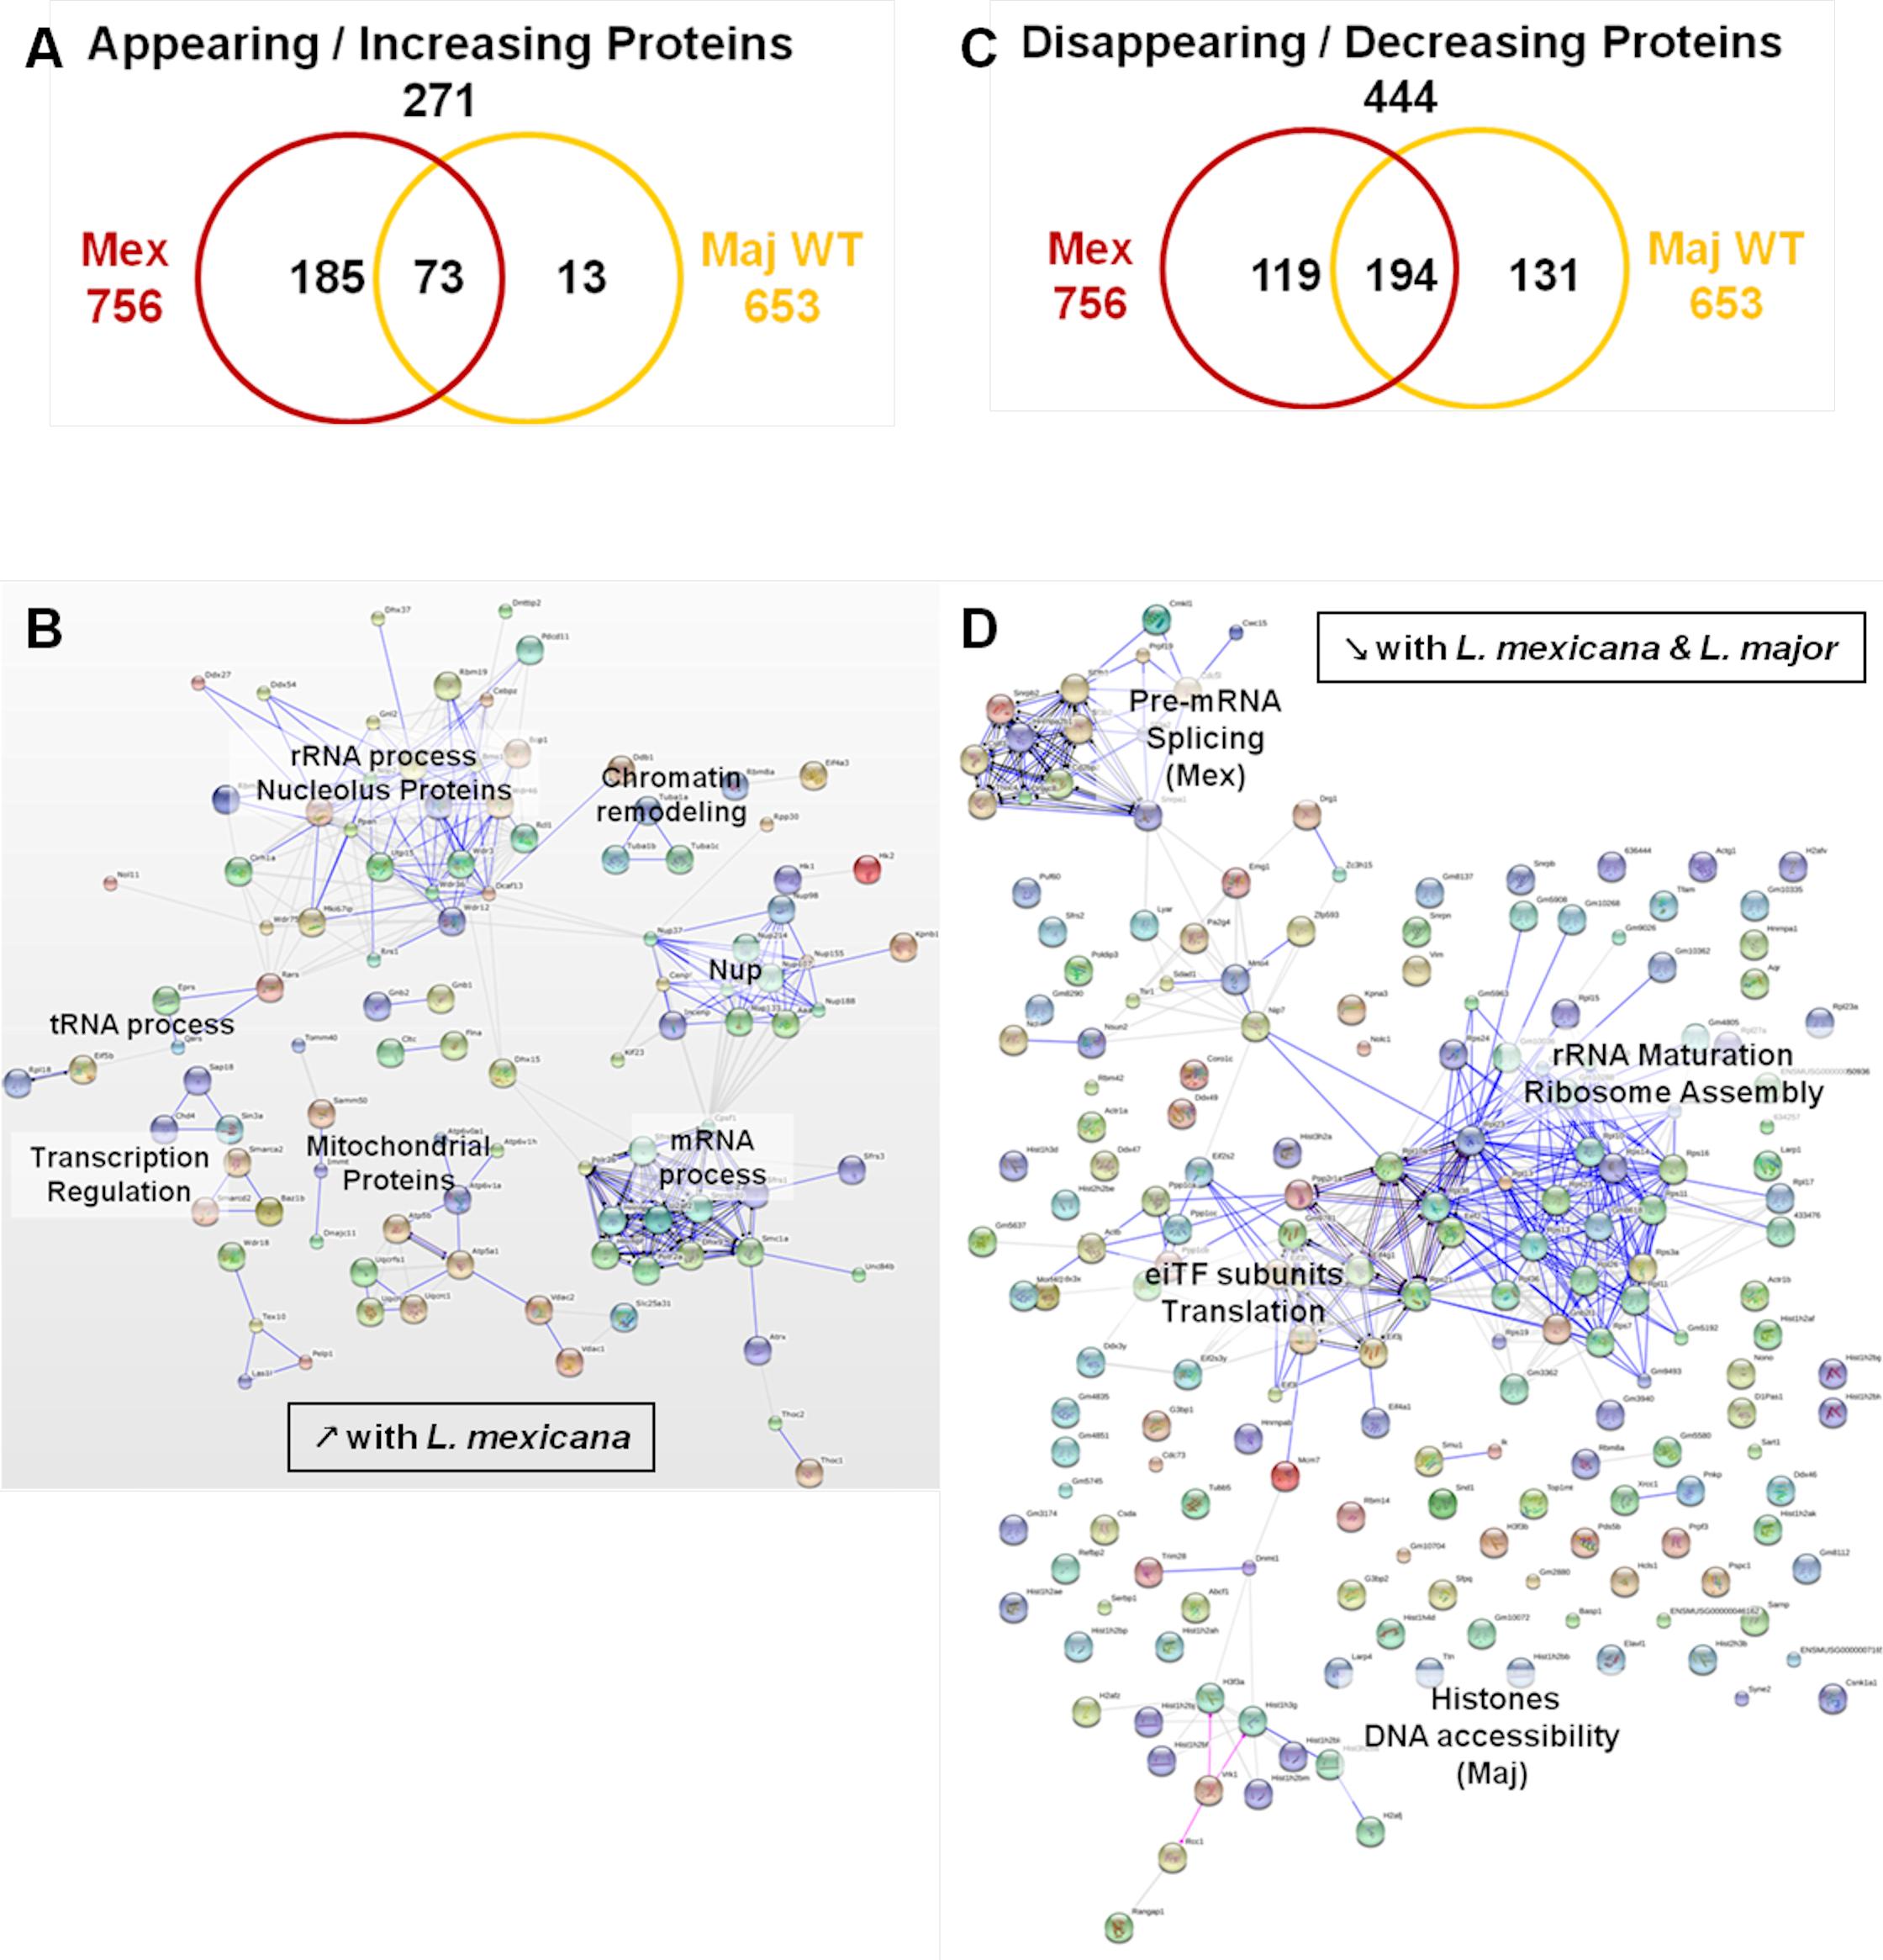 Comparative proteomic analysis of macrophage nuclei after infection with <i>L</i>. <i>major WT</i> or <i>L</i>. <i>mexicana</i>.